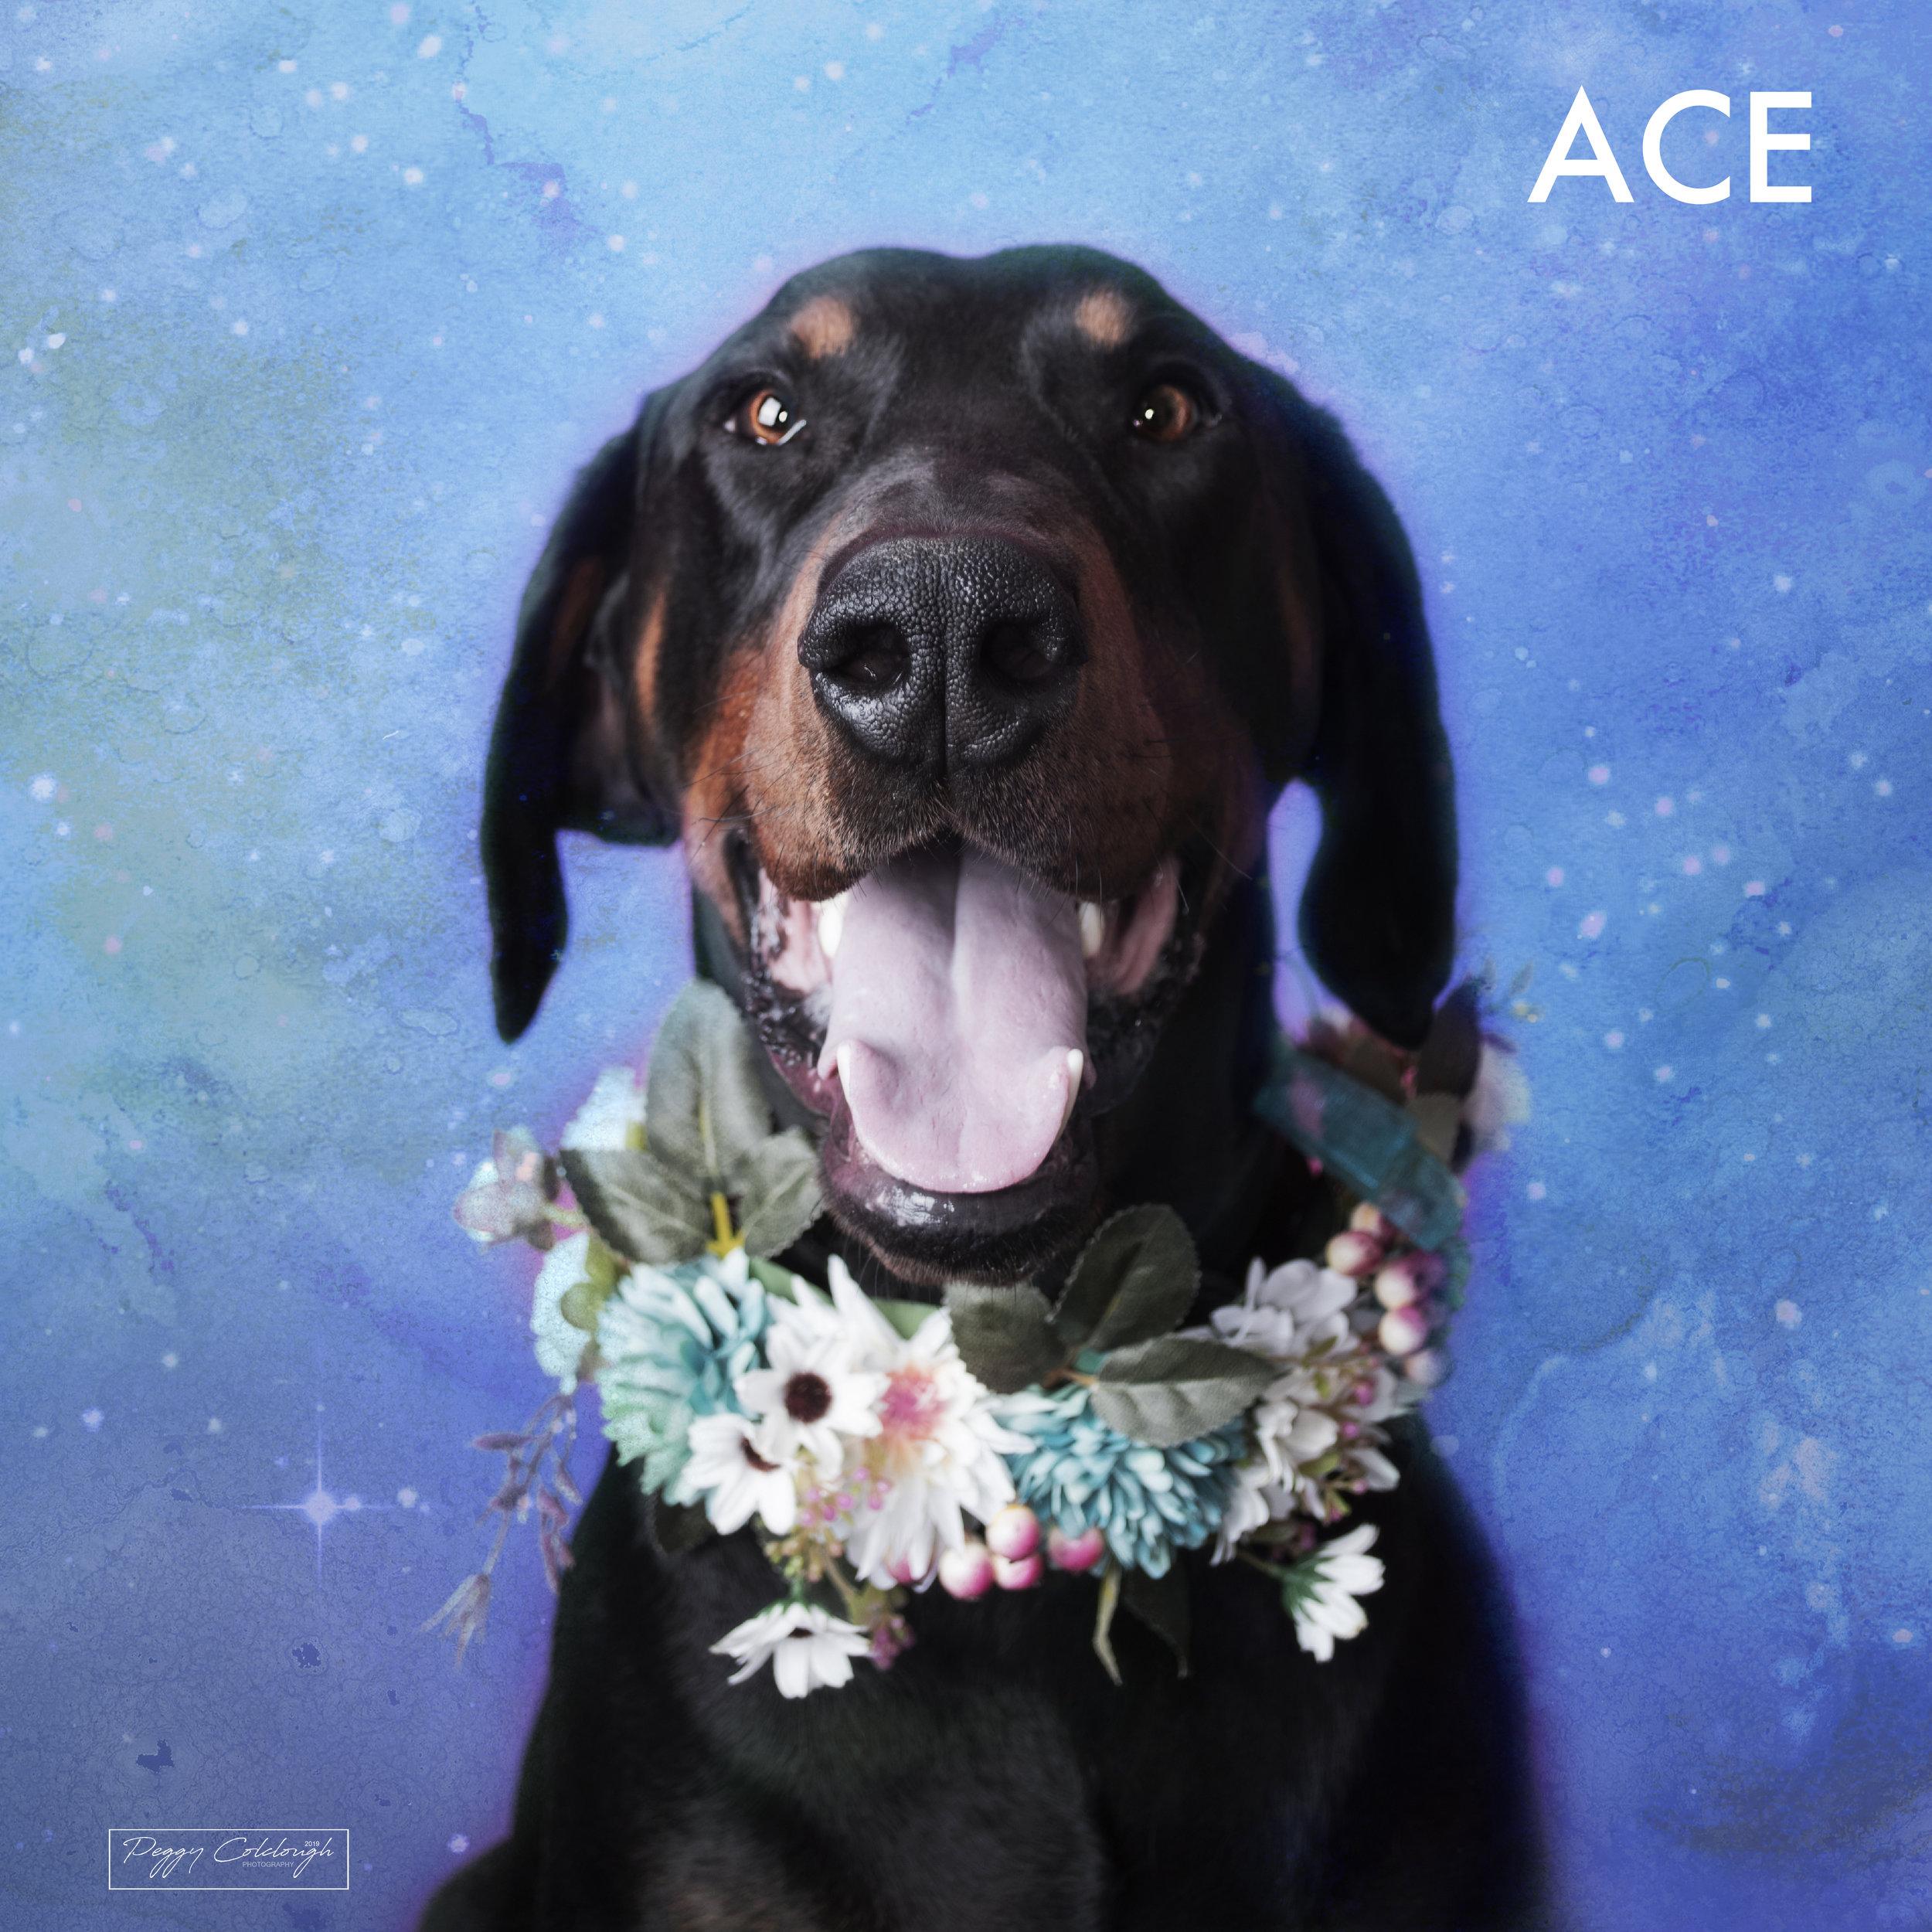 16. Ace.jpg